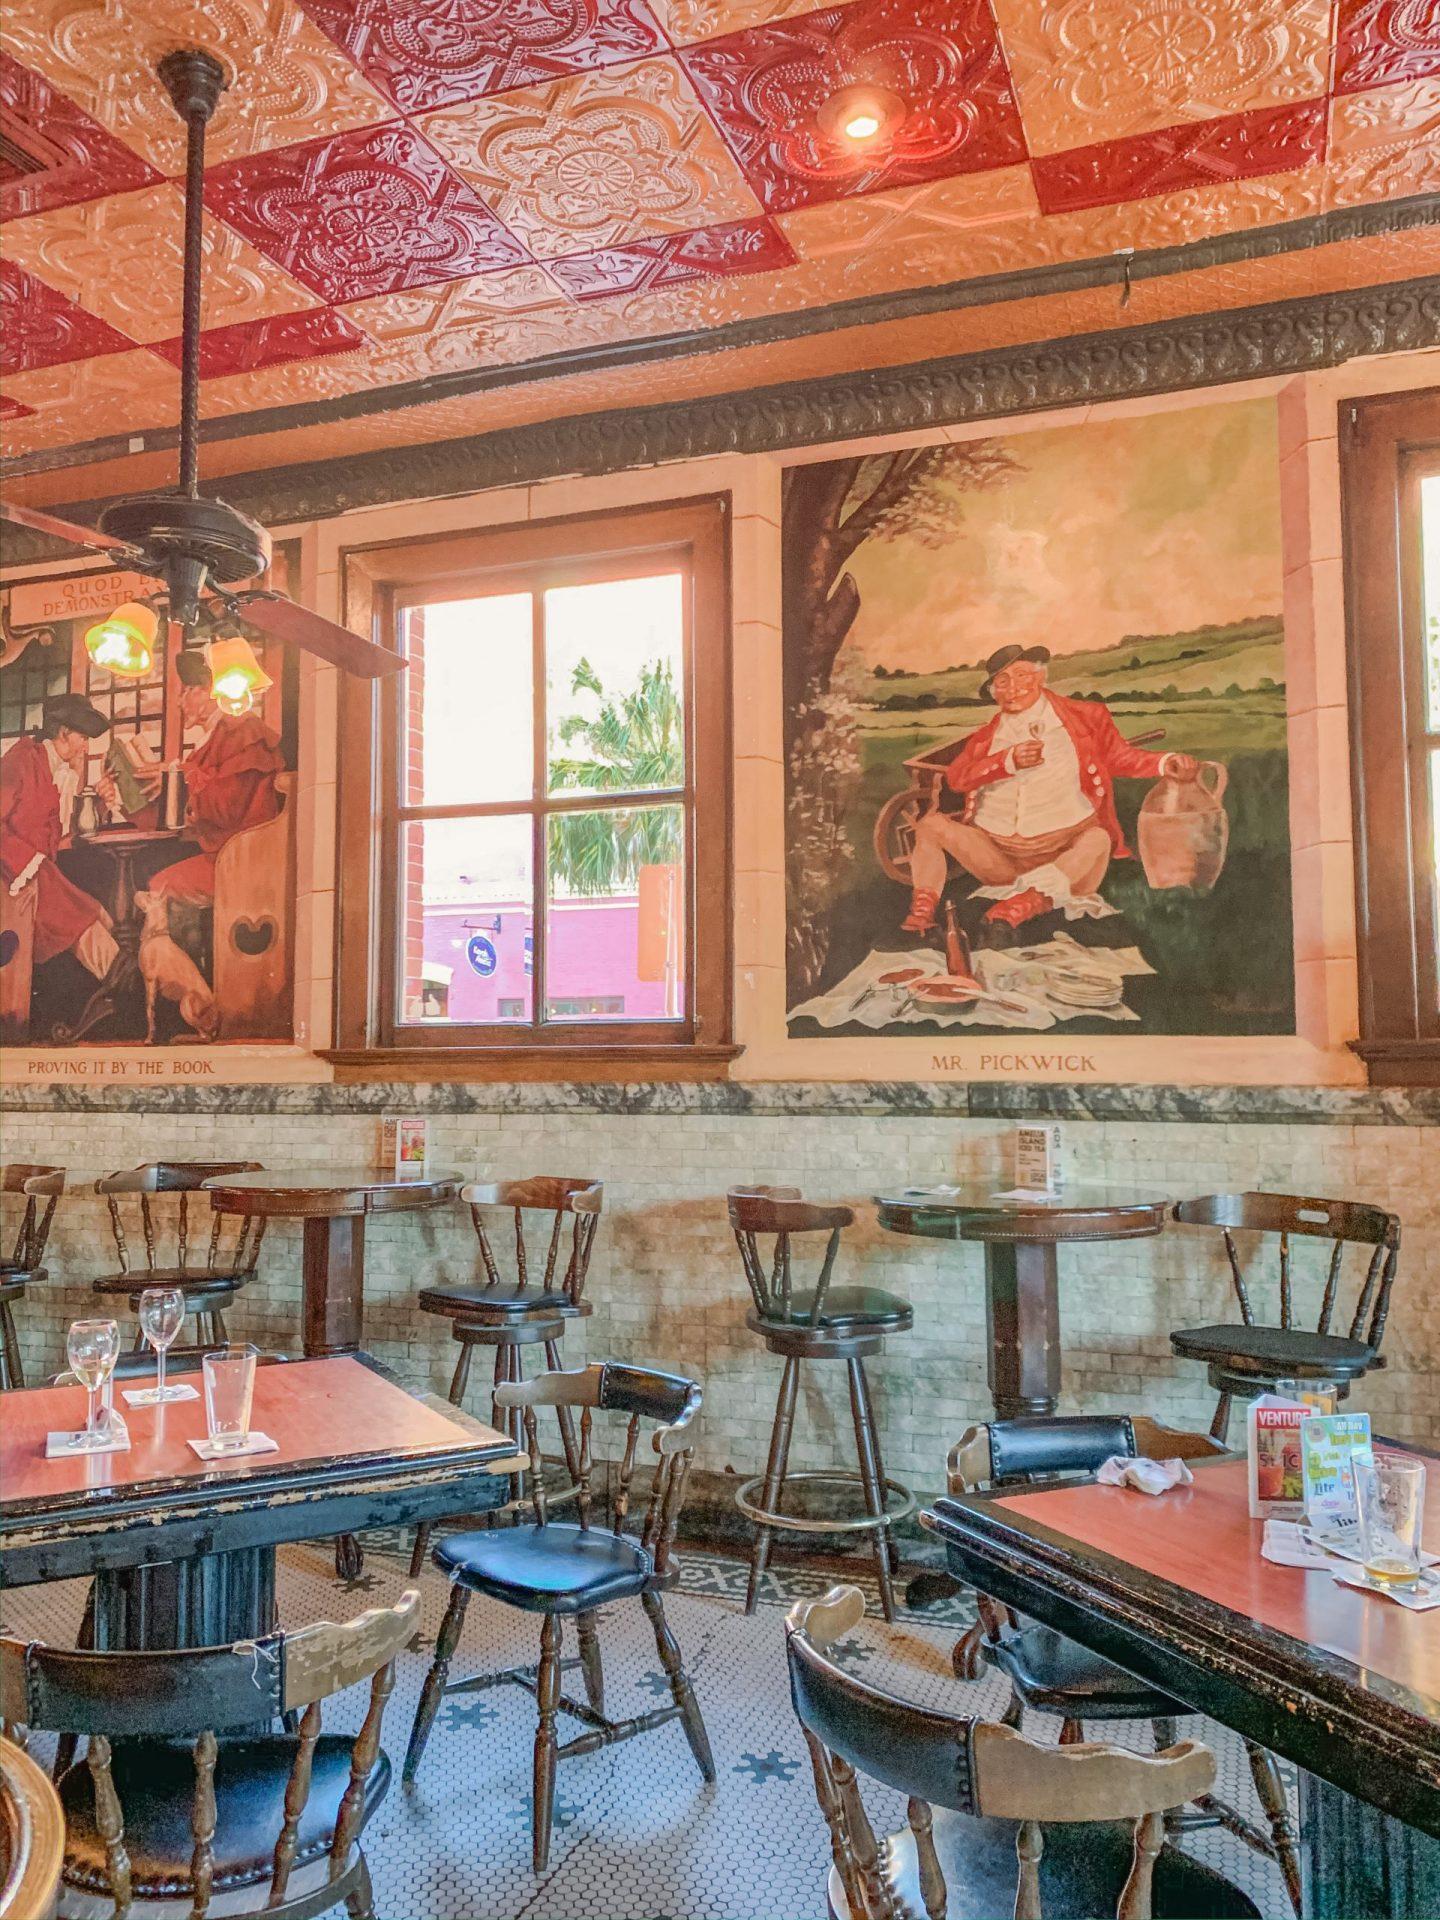 Bijuleni | Amelia Island Travel Guide - The Palace Saloon